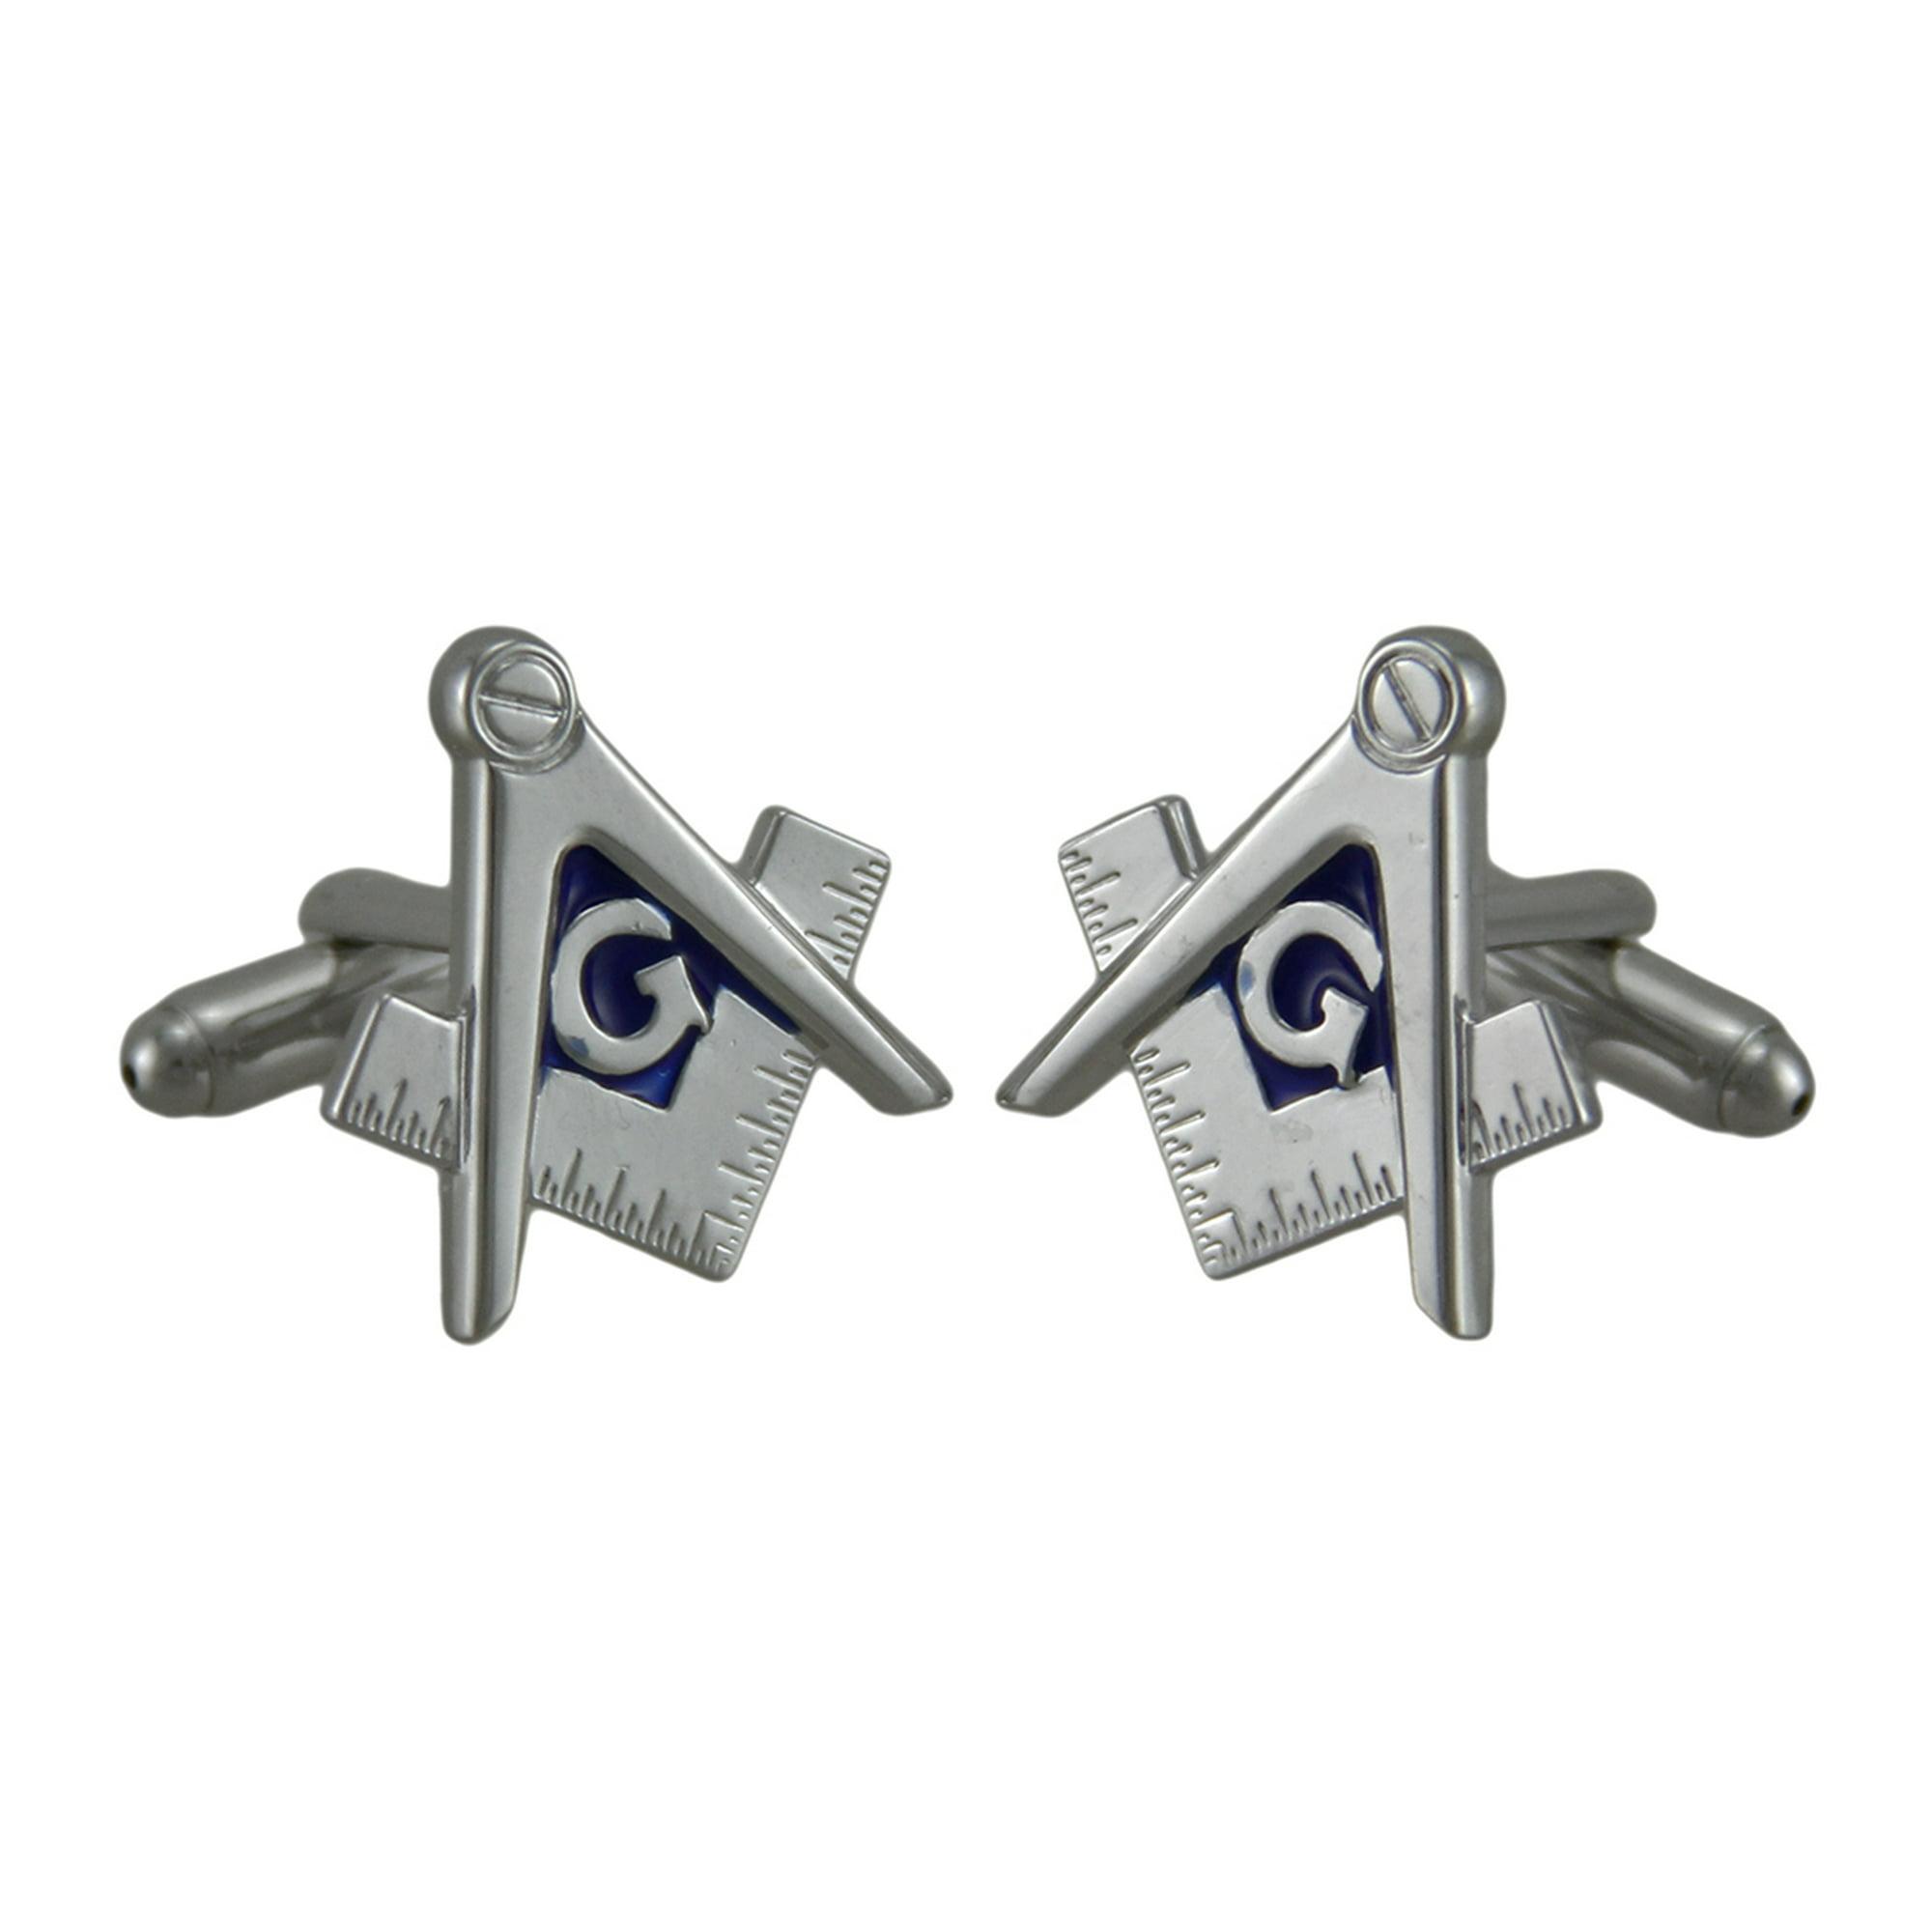 Masonic Compass and Square Polished Silver Finish Cufflinks